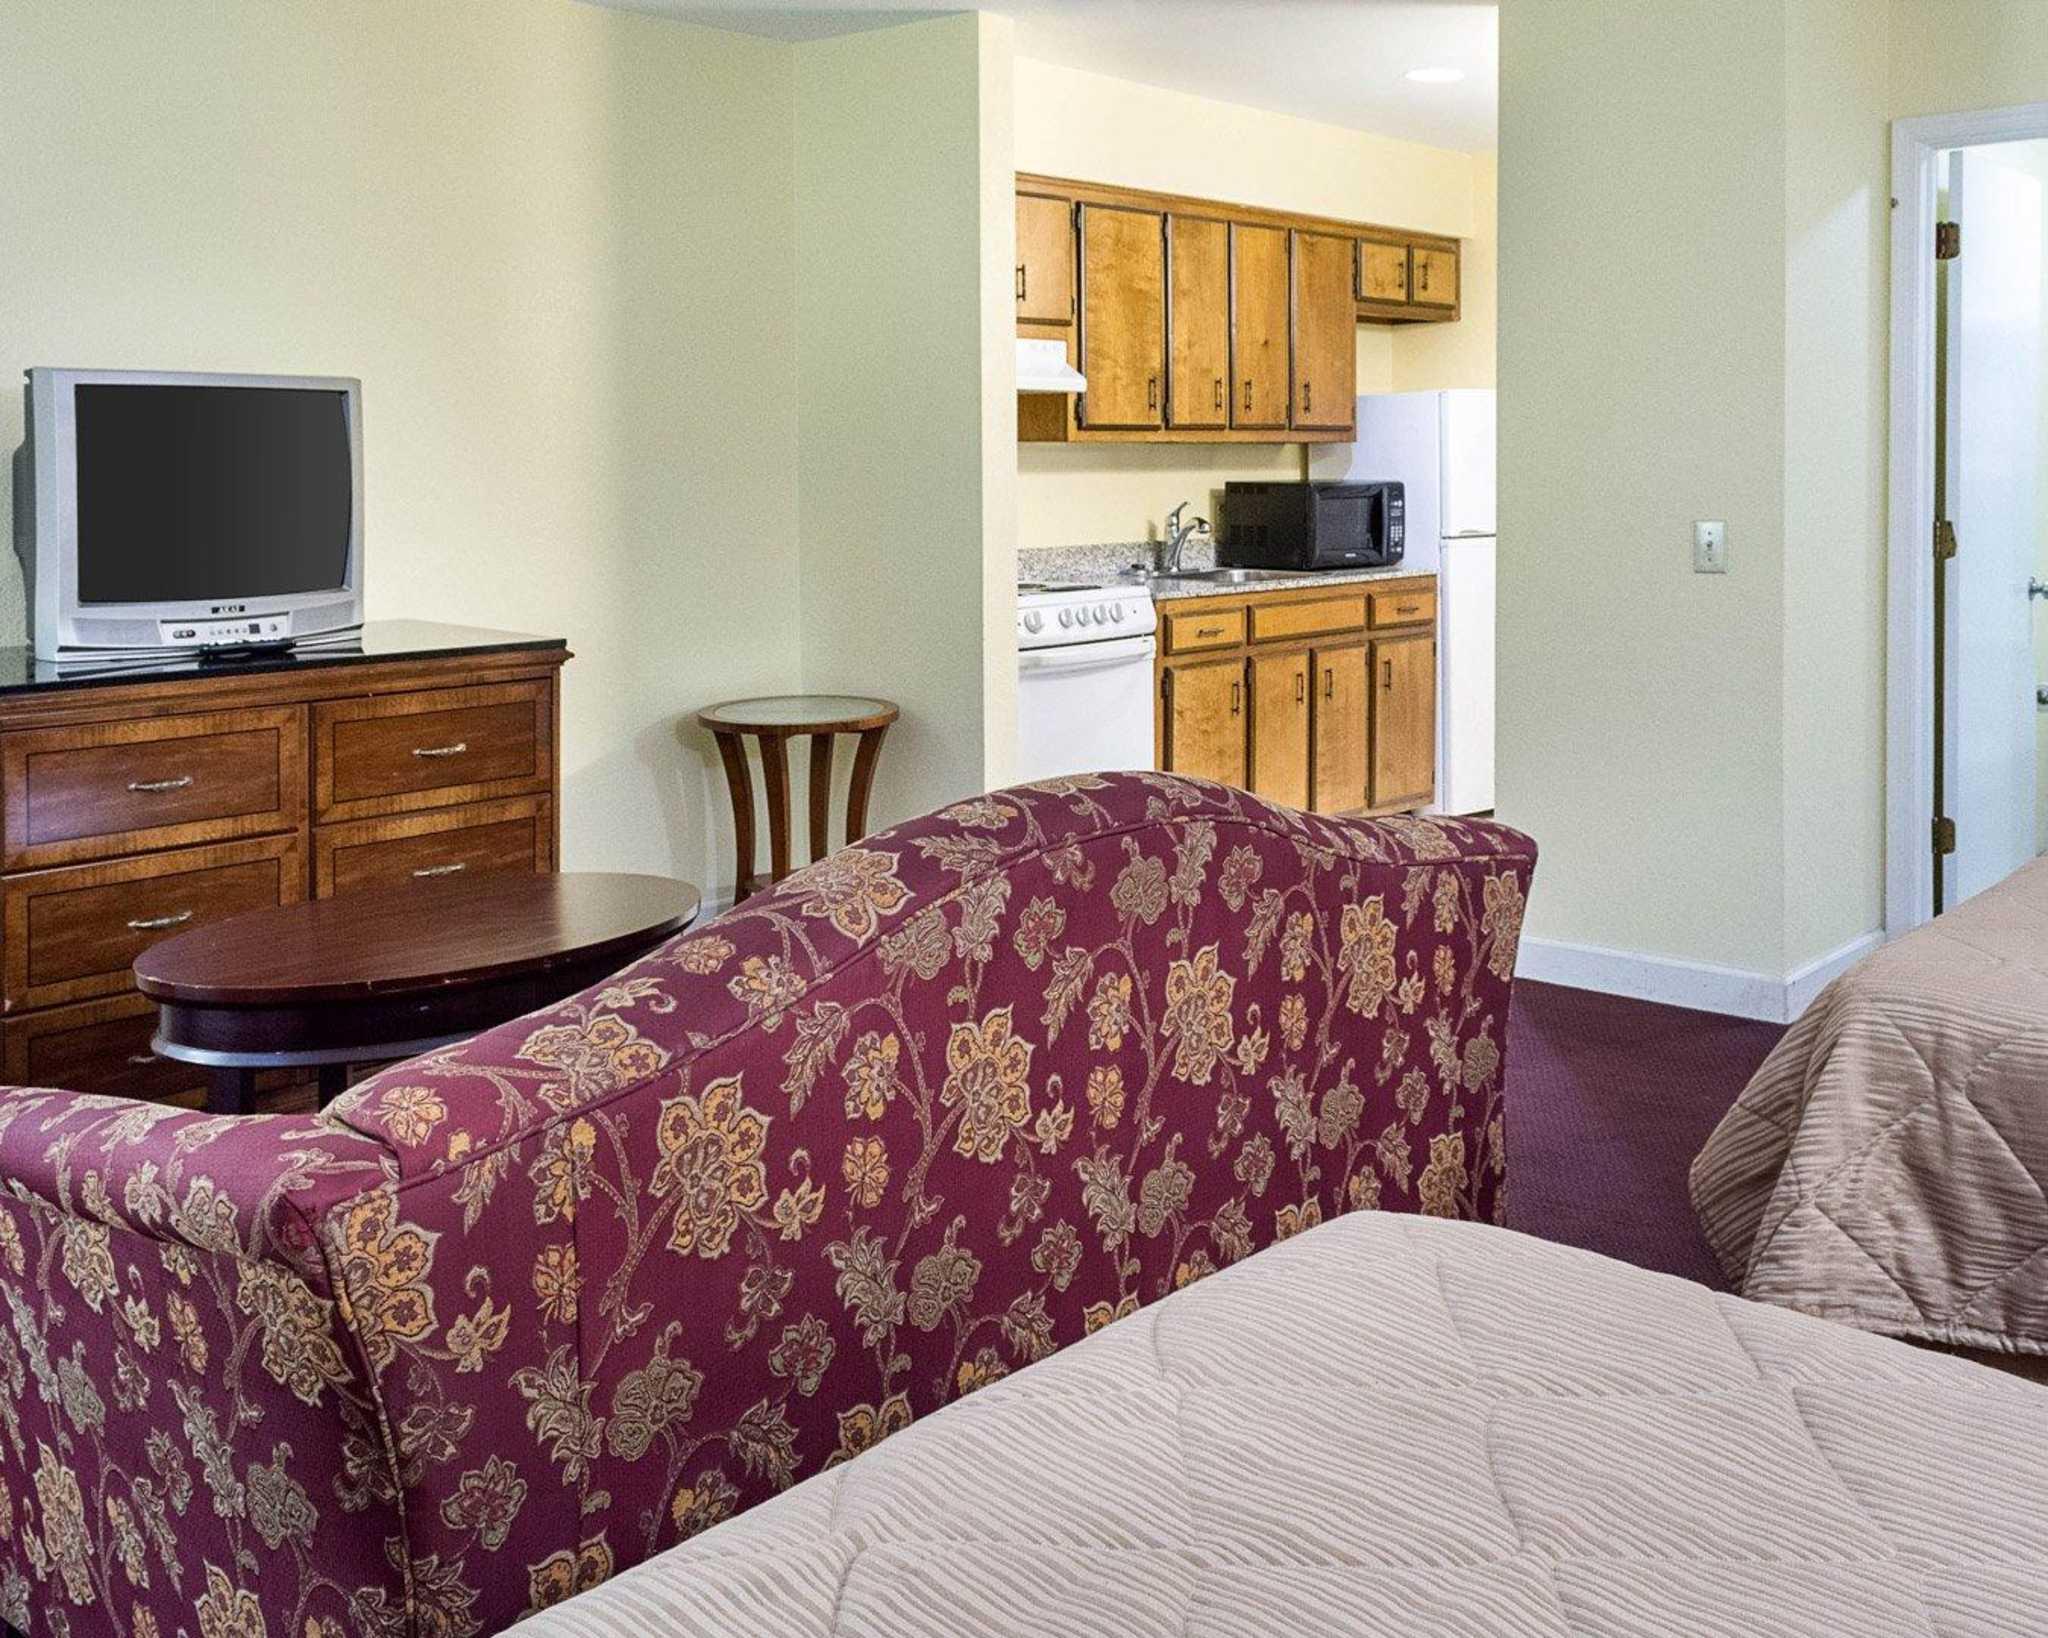 Econo Lodge Inn & Suites Carrollton Smithfield image 18